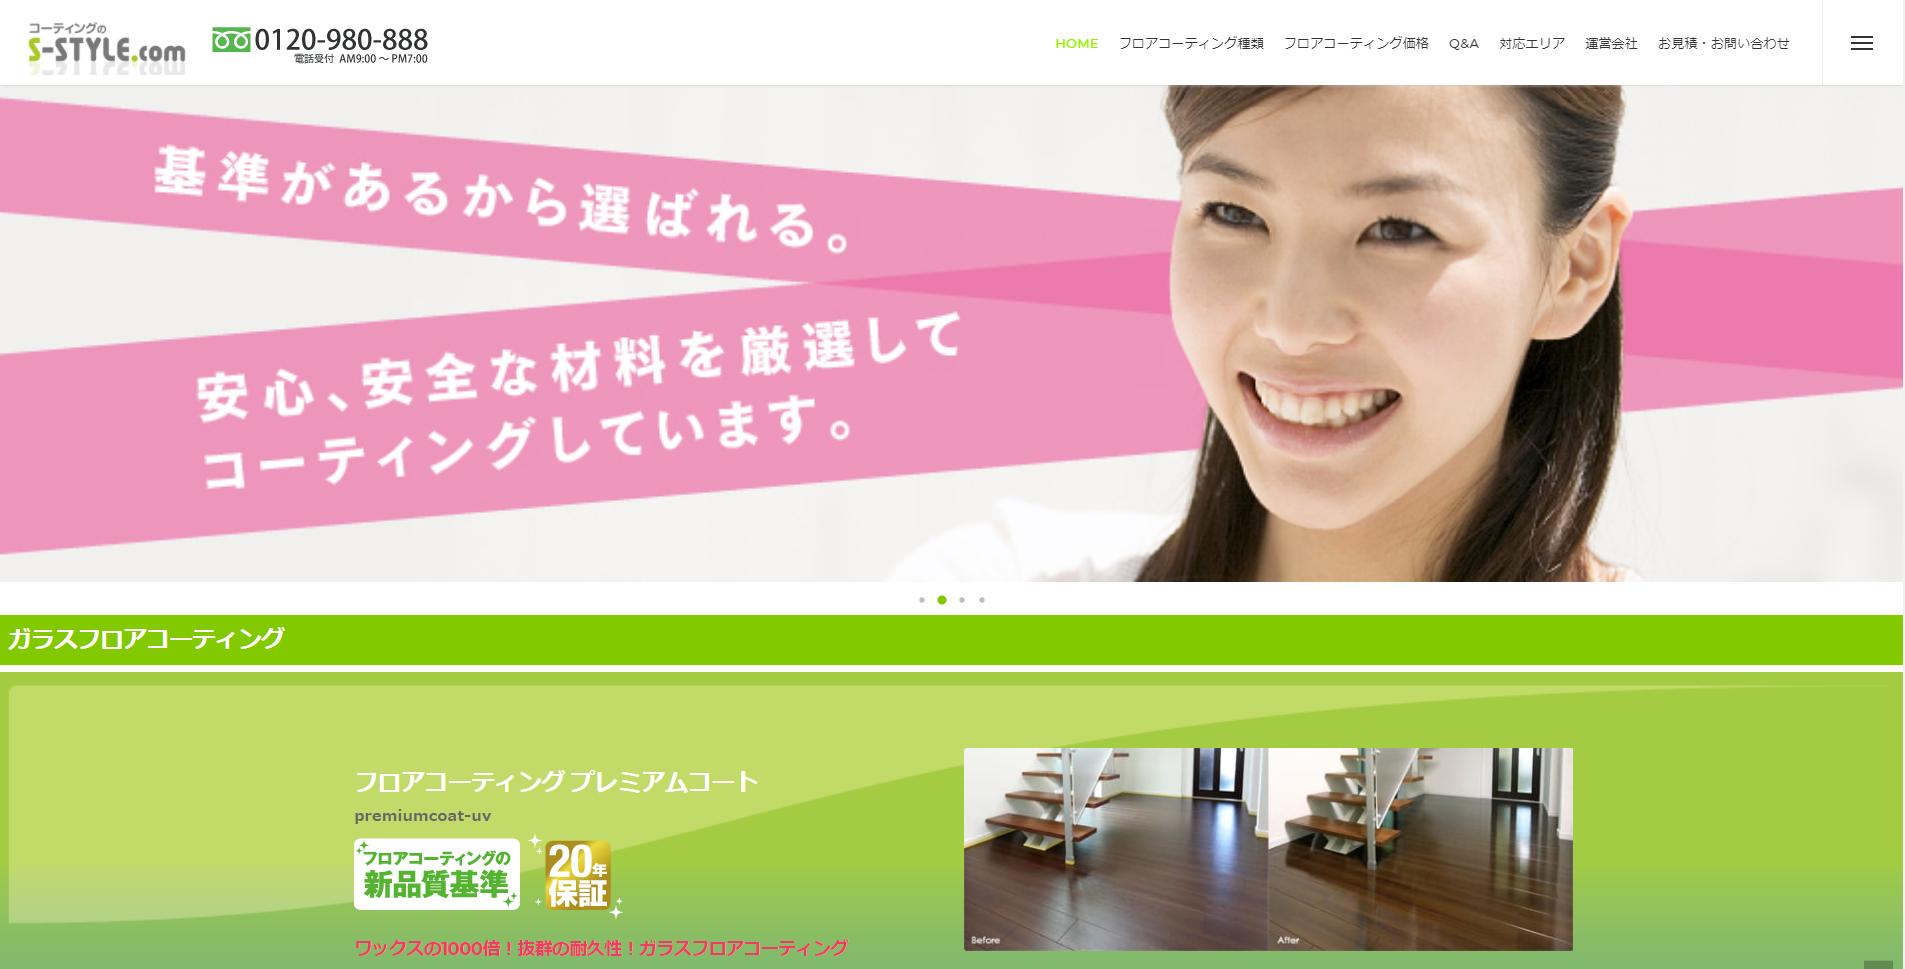 S-STYLE サイト構築リニューアル